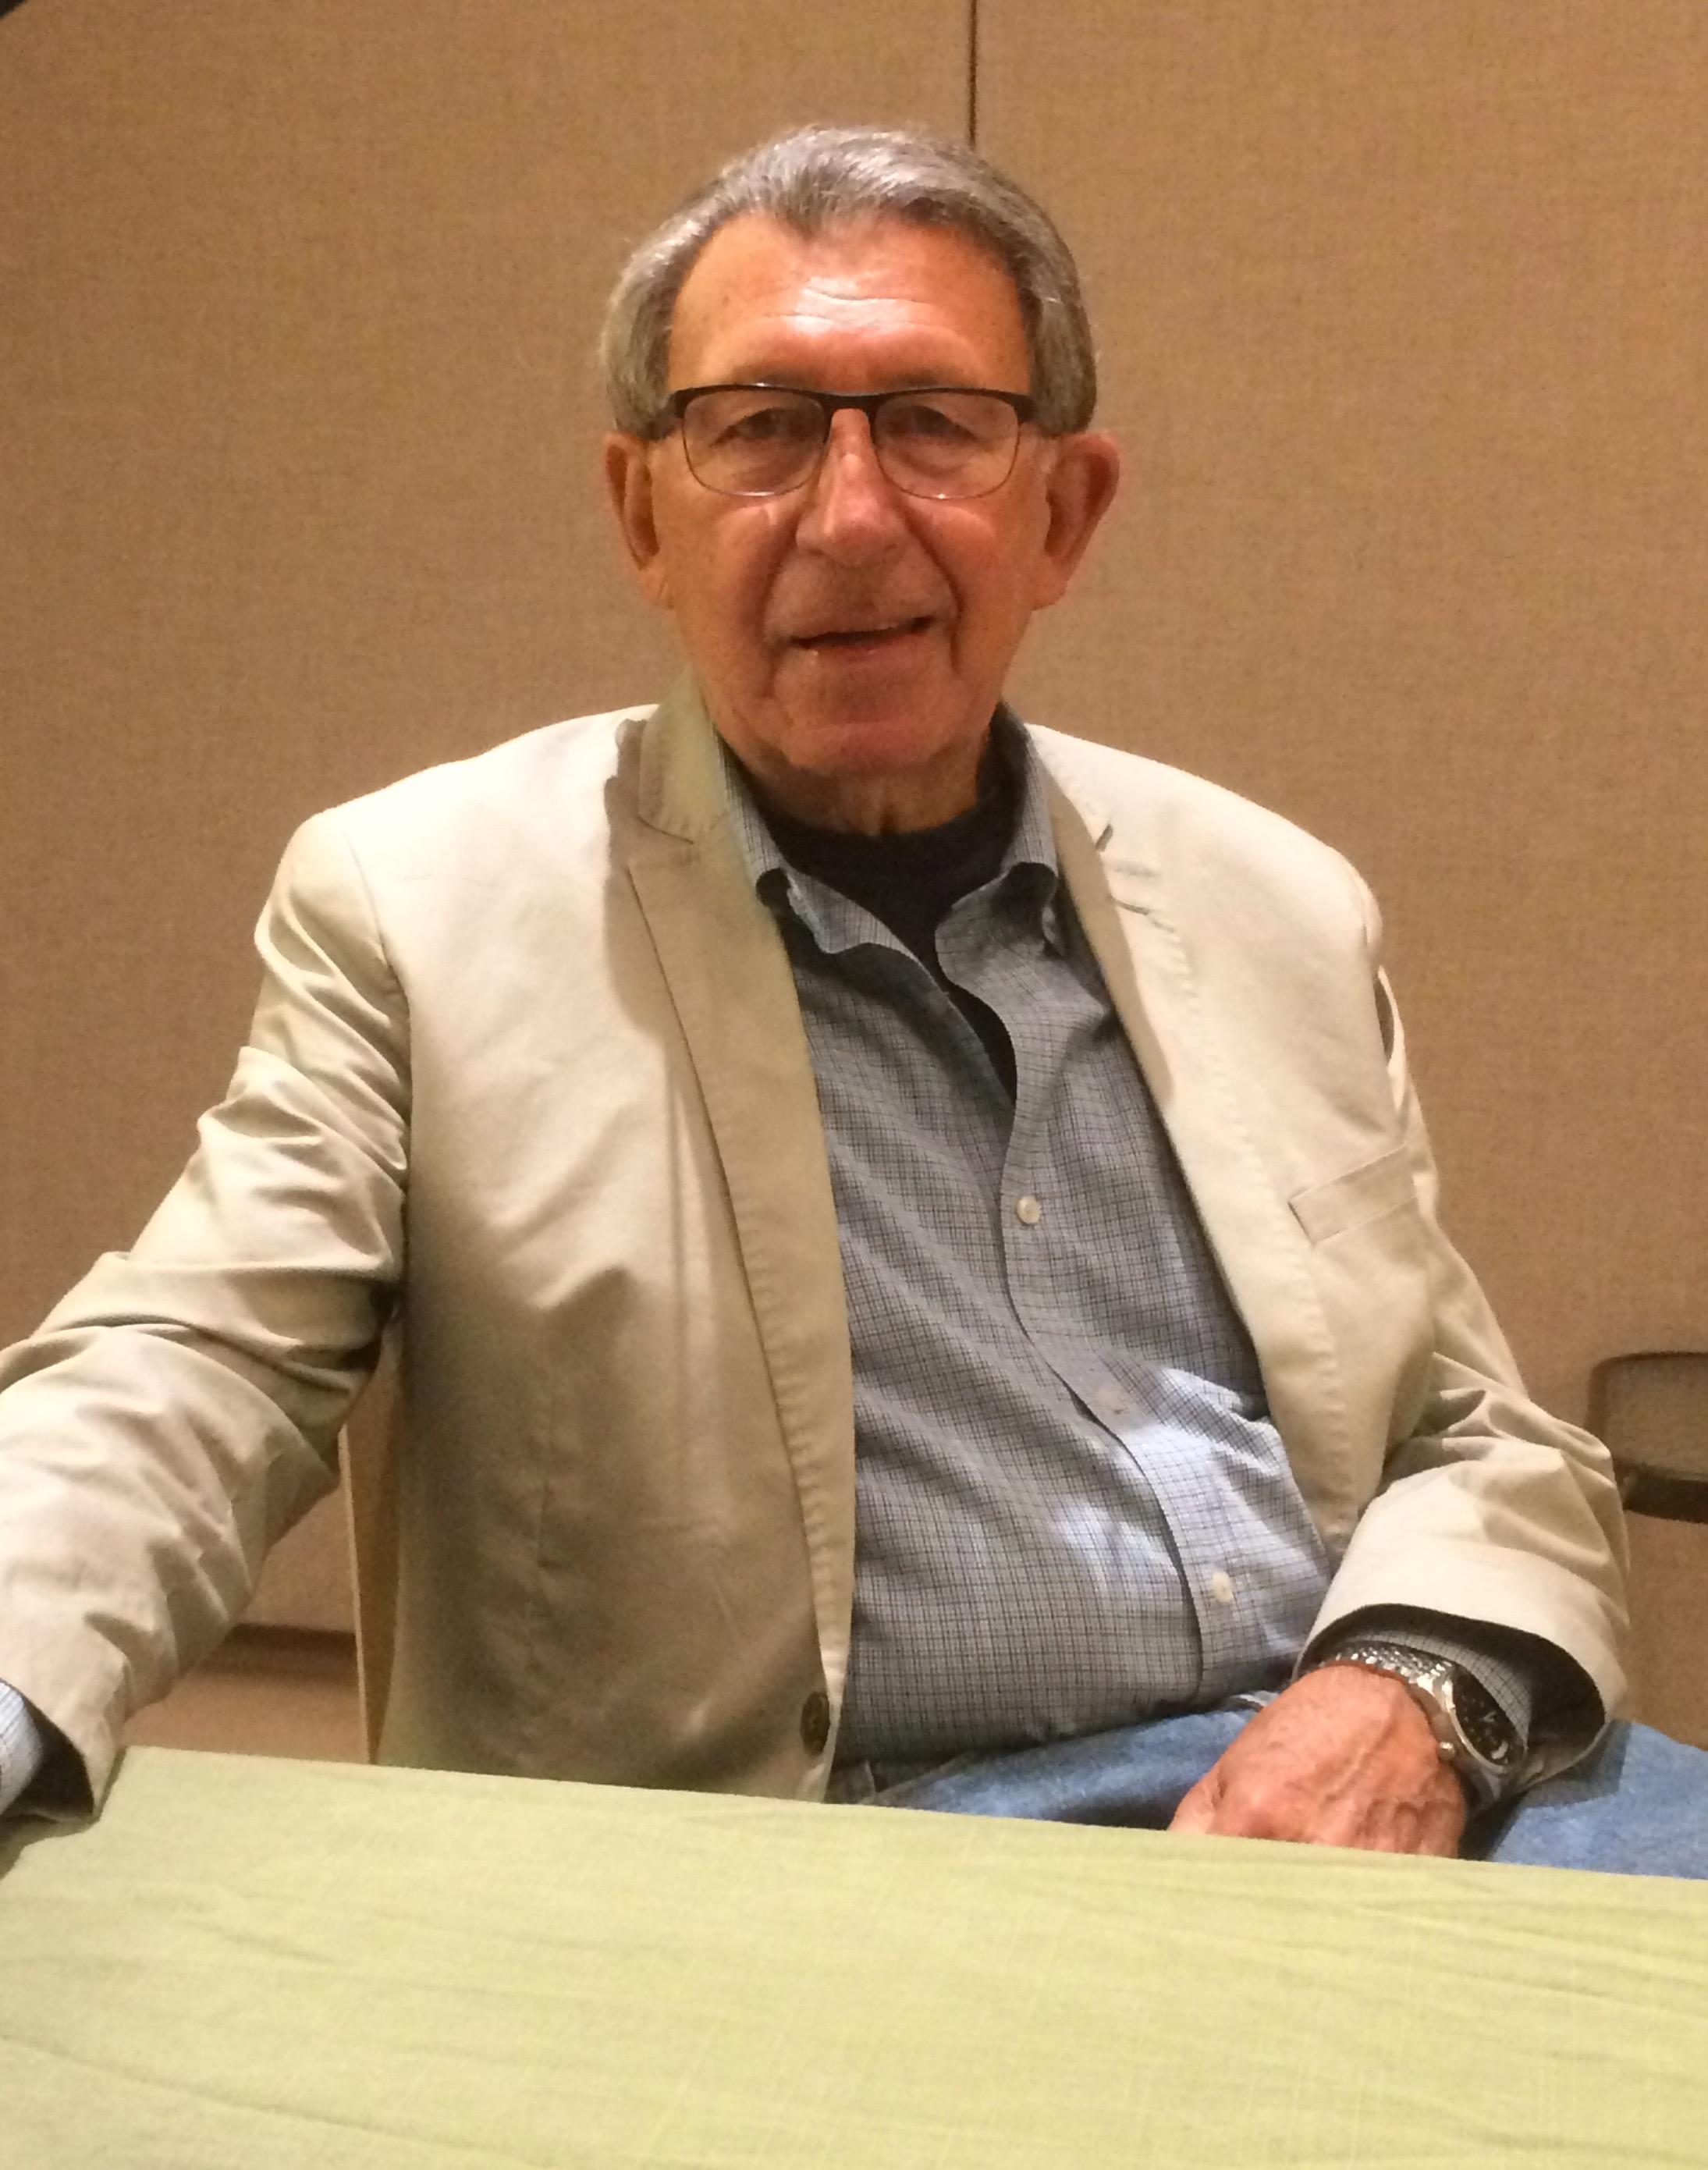 Charles Royer